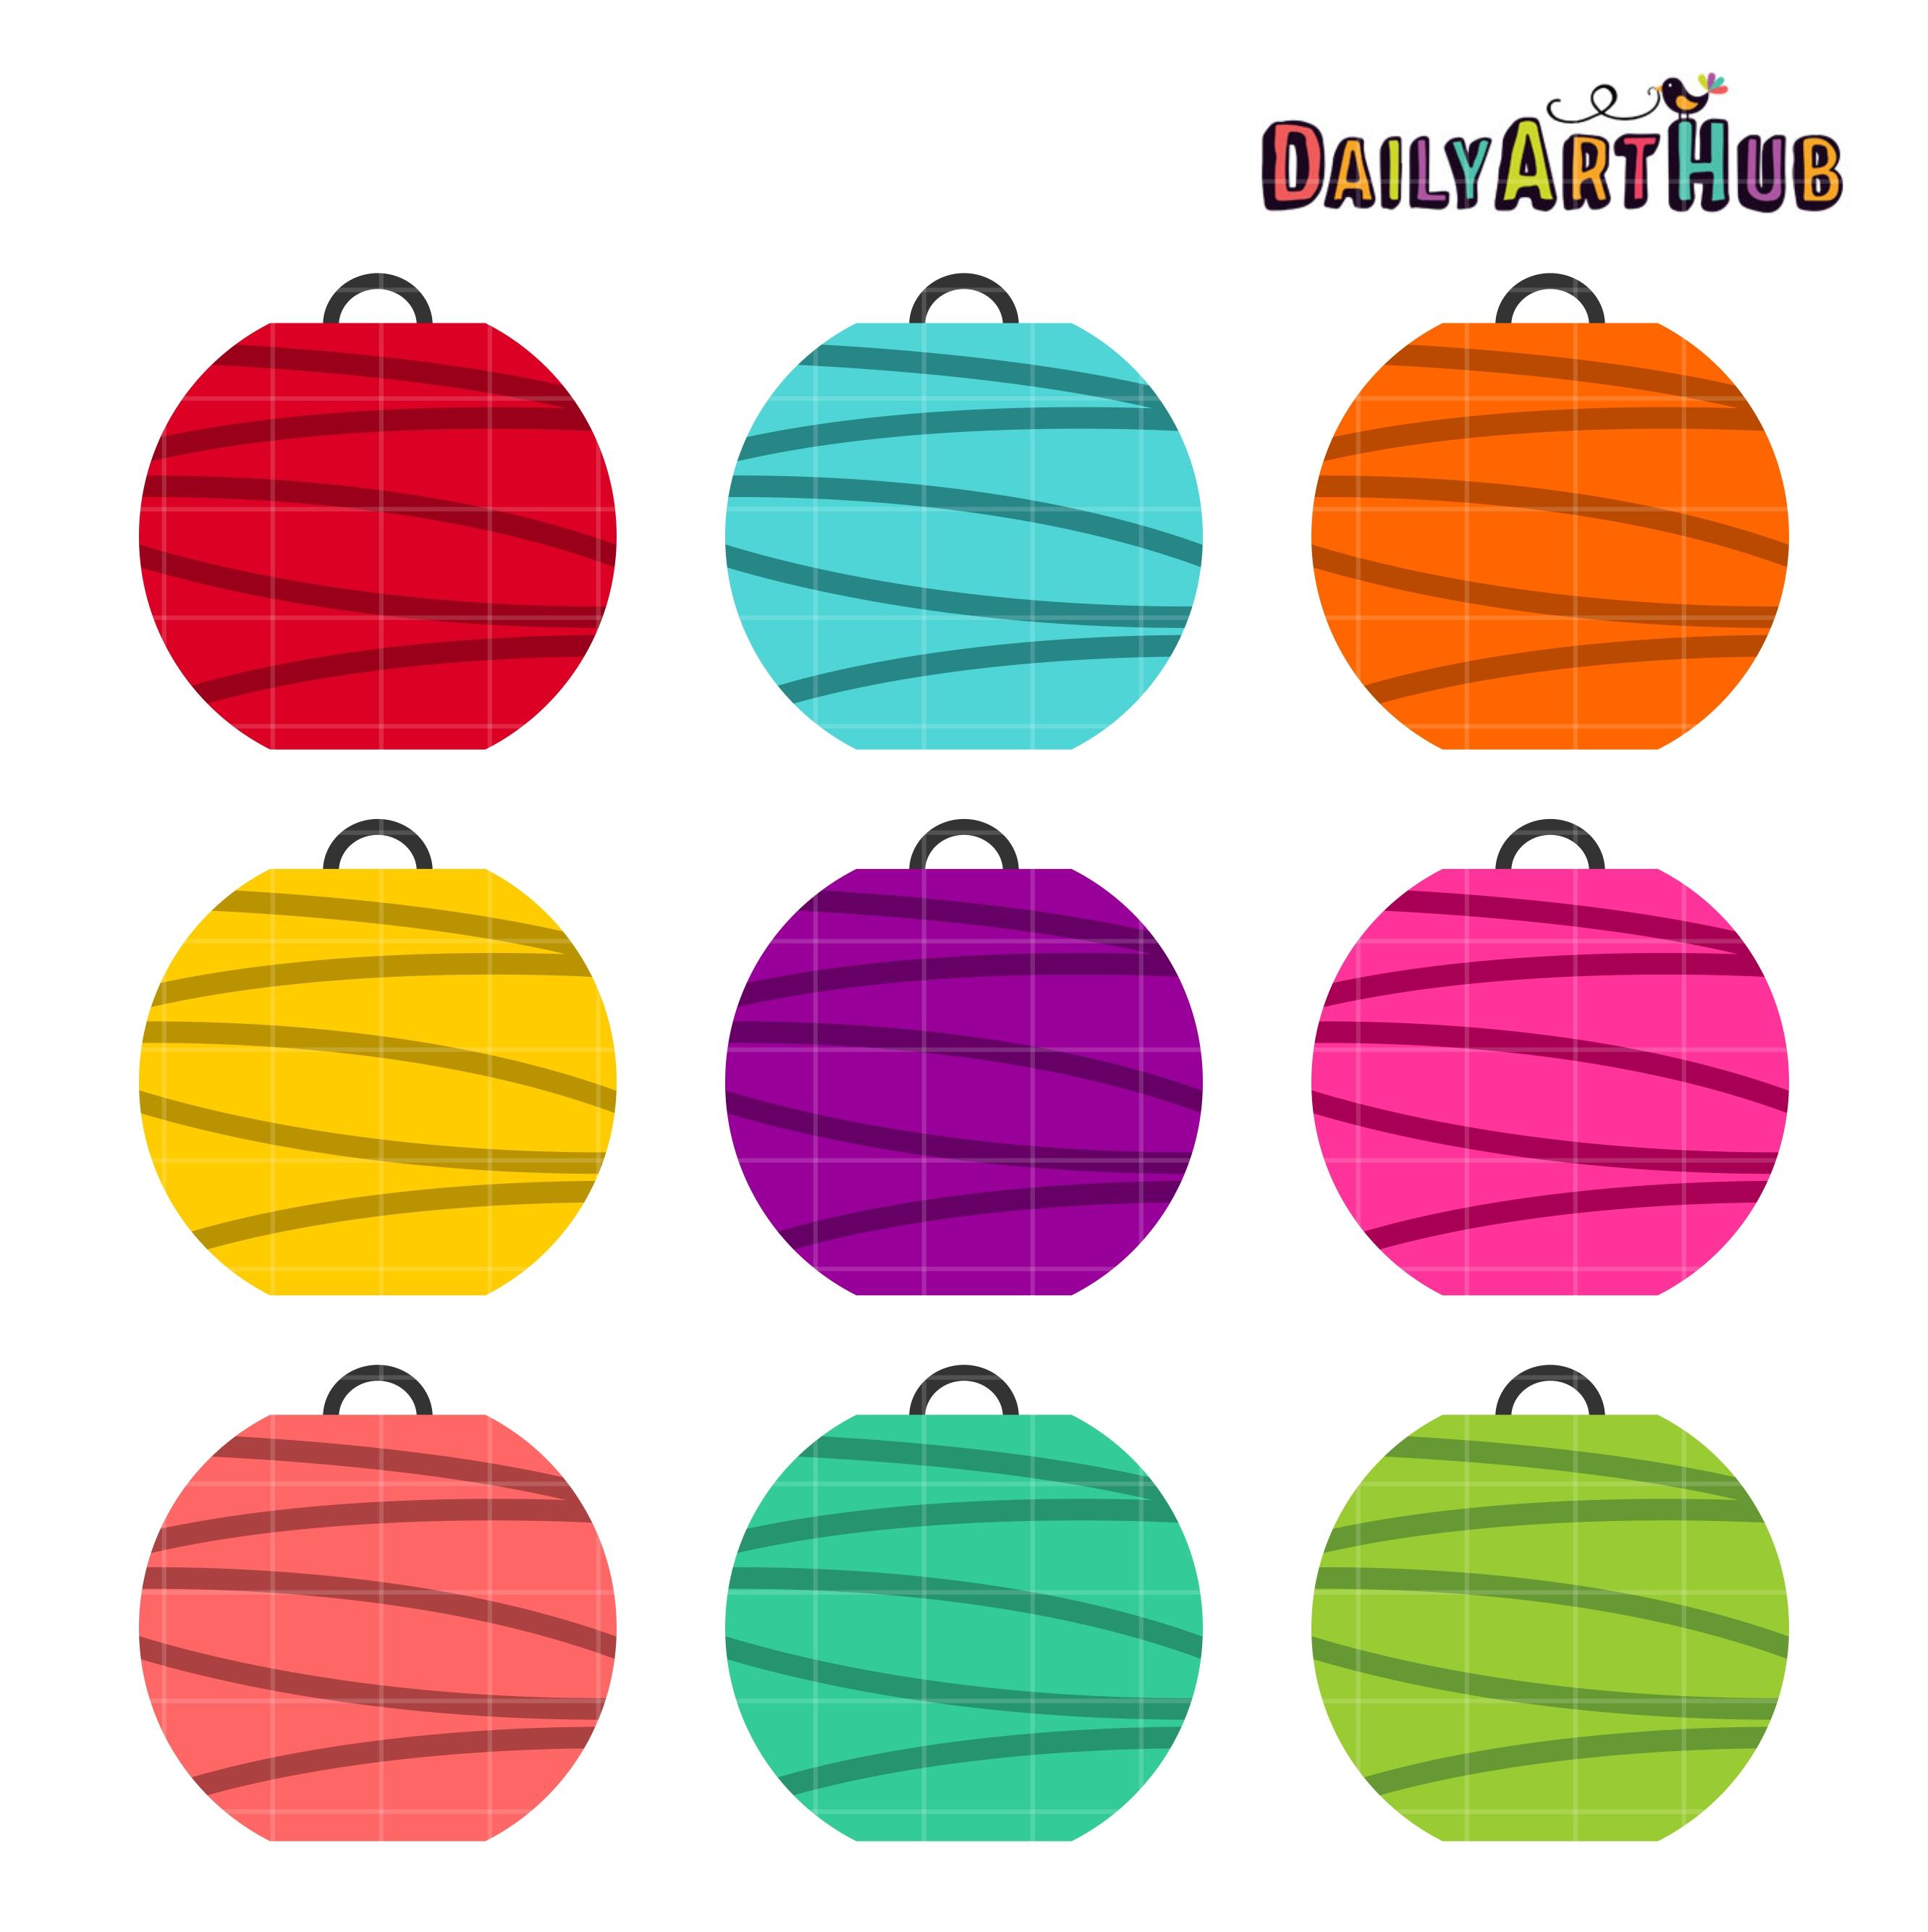 colorful paper lanterns clip art set daily art hub free clip art